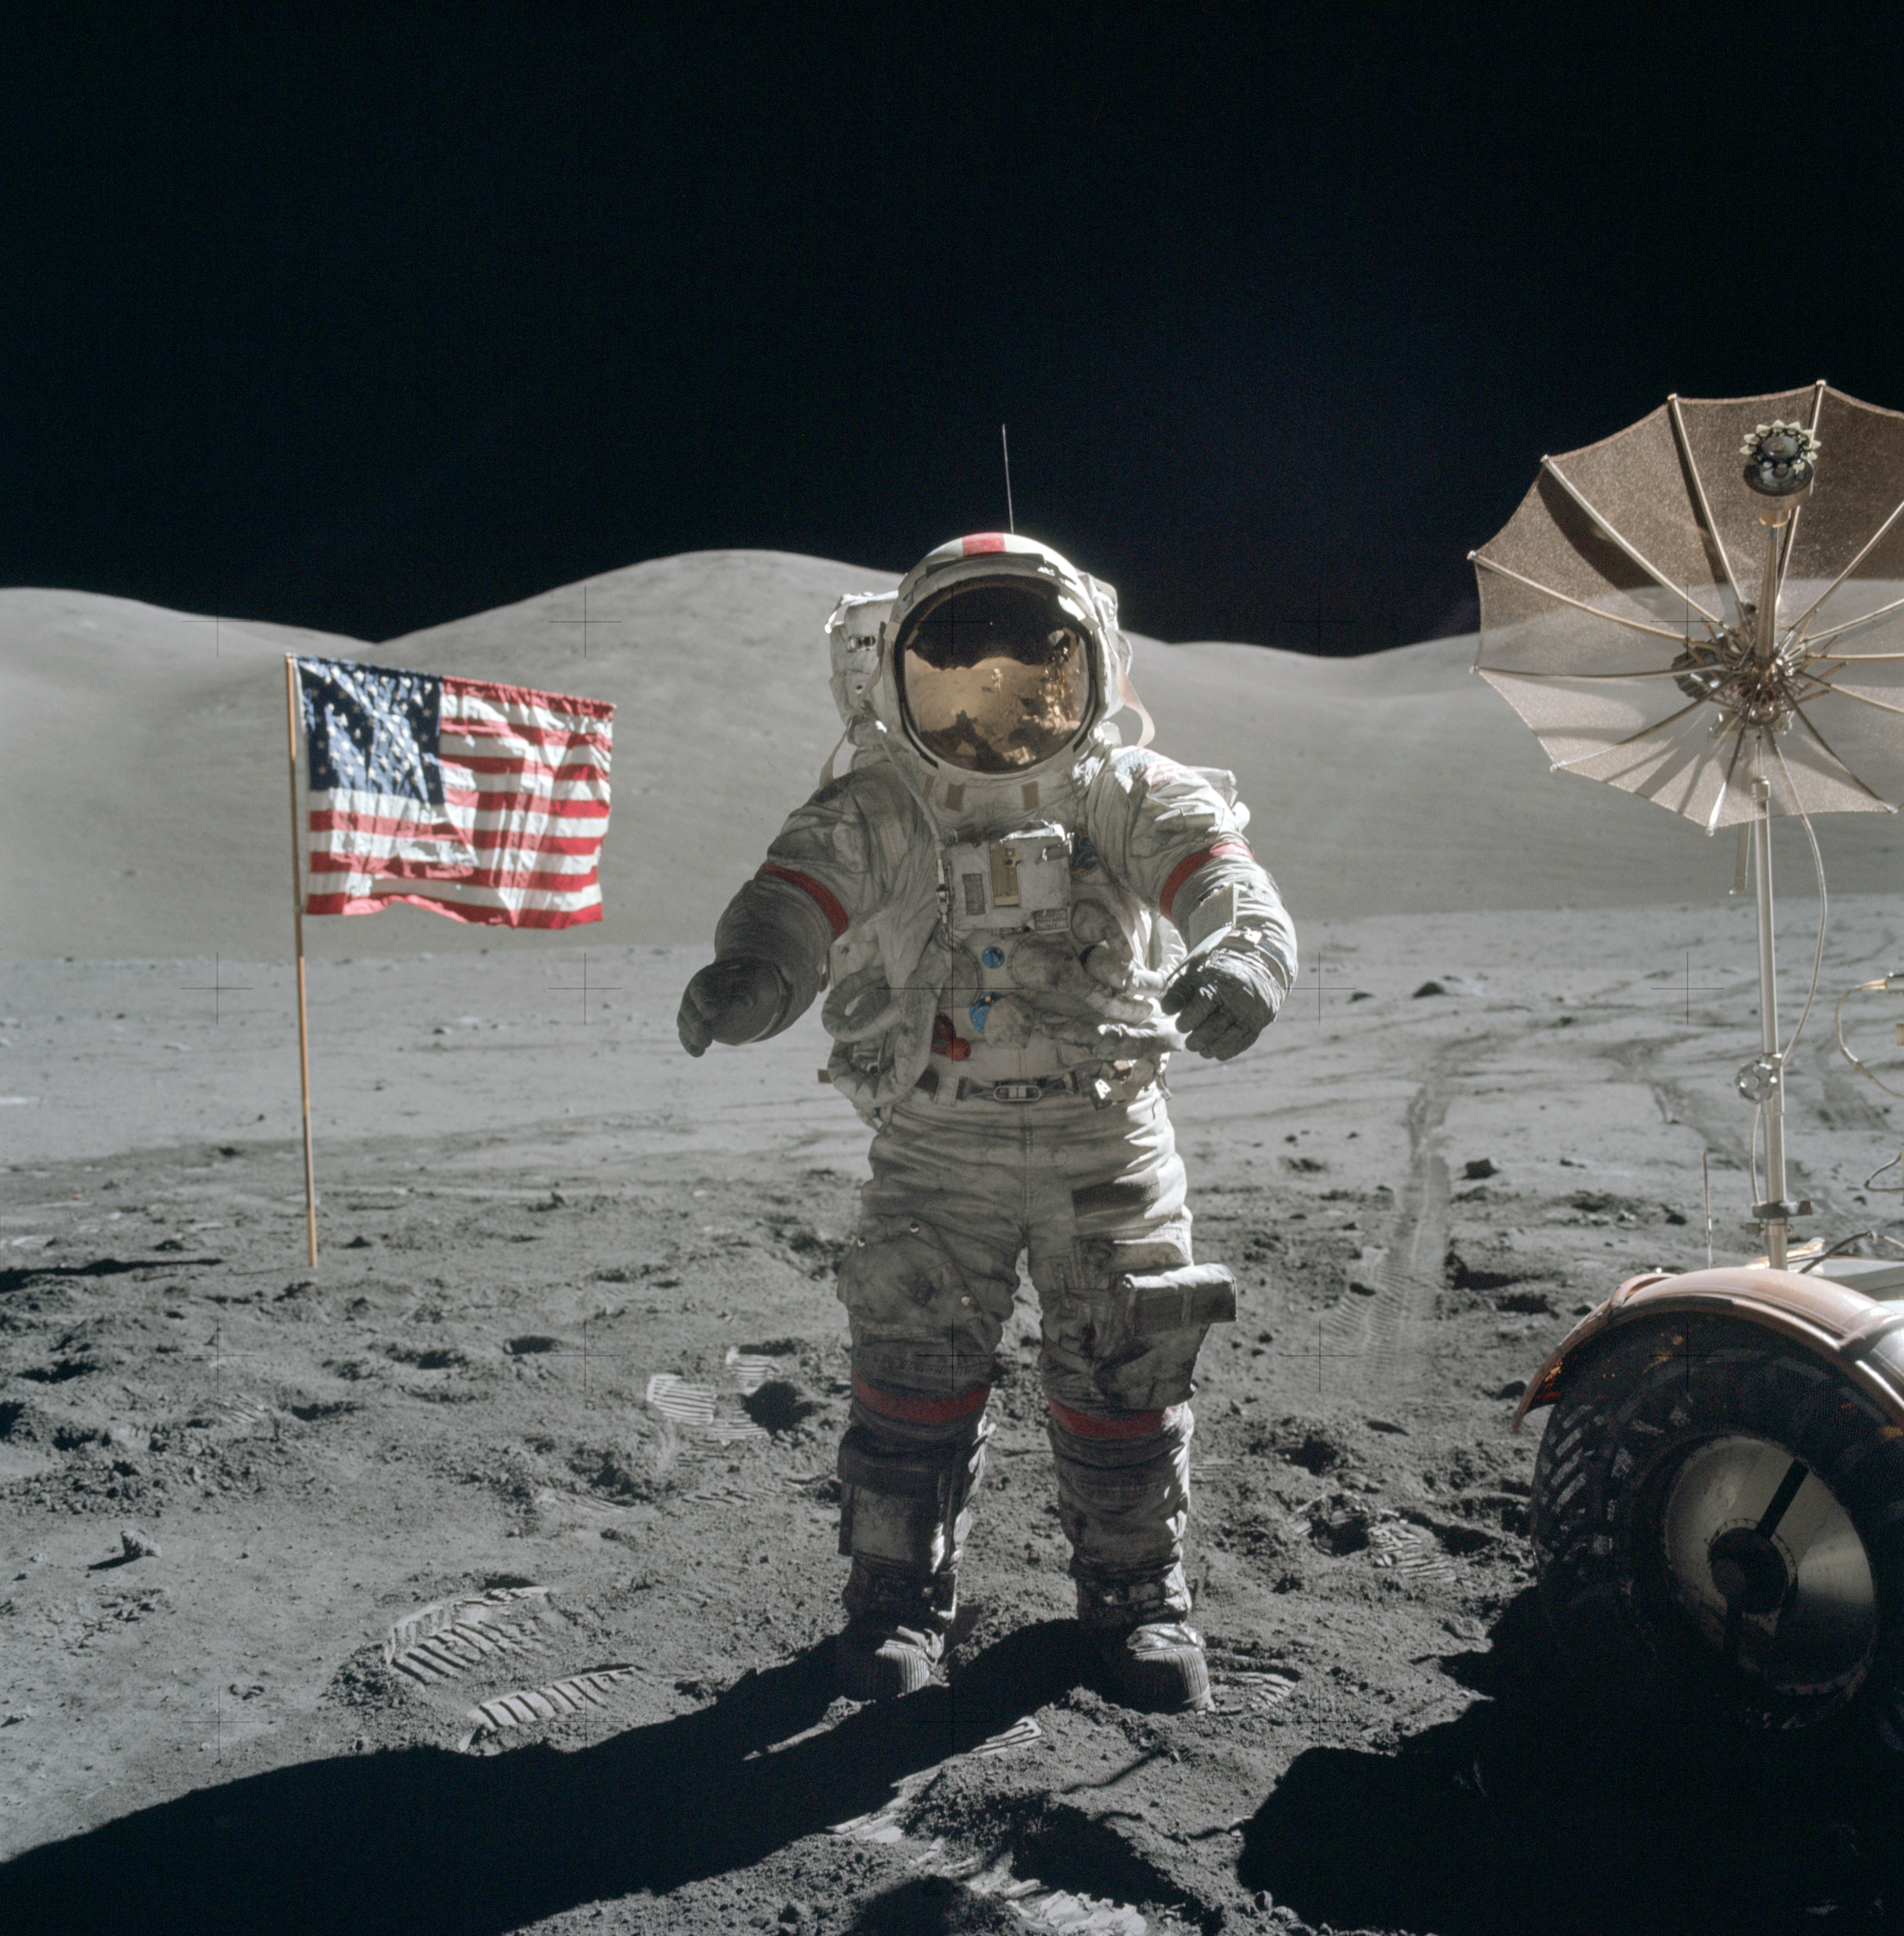 Gene Cernan exploring Taurus Littrow on the Moon. Credit: NASA/Jack Schmitt